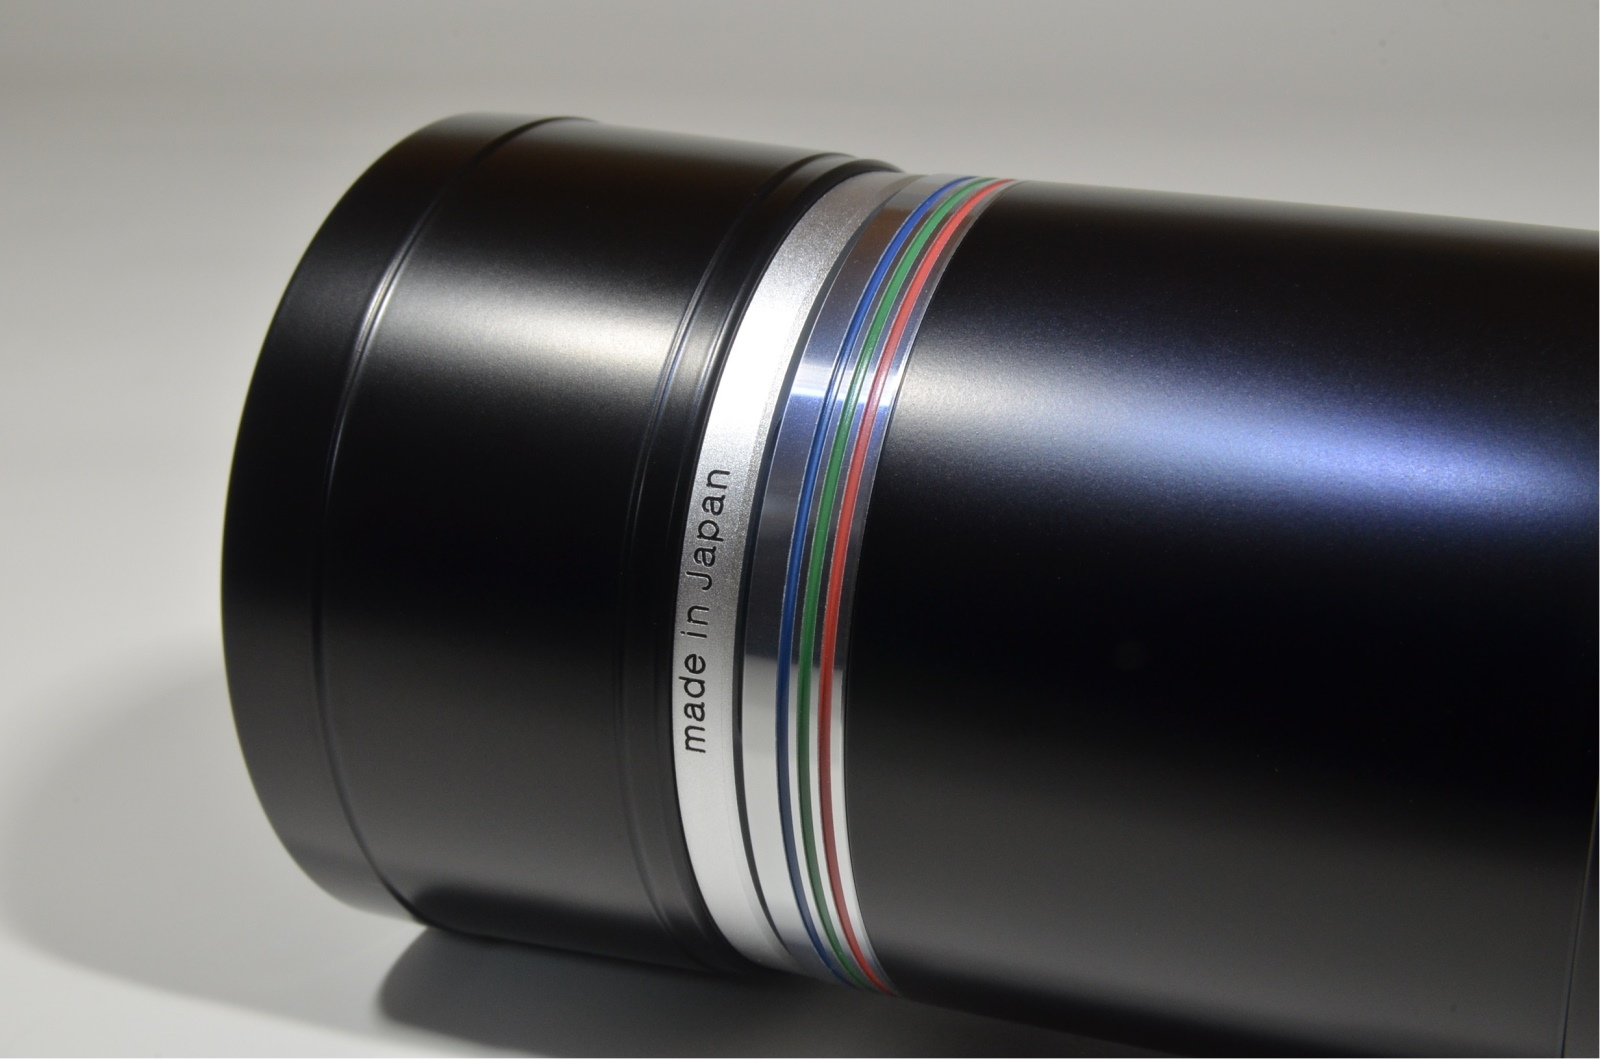 voigtlander apo-lanthar 180mm f4 sl for ai-s nikon with lh-75s